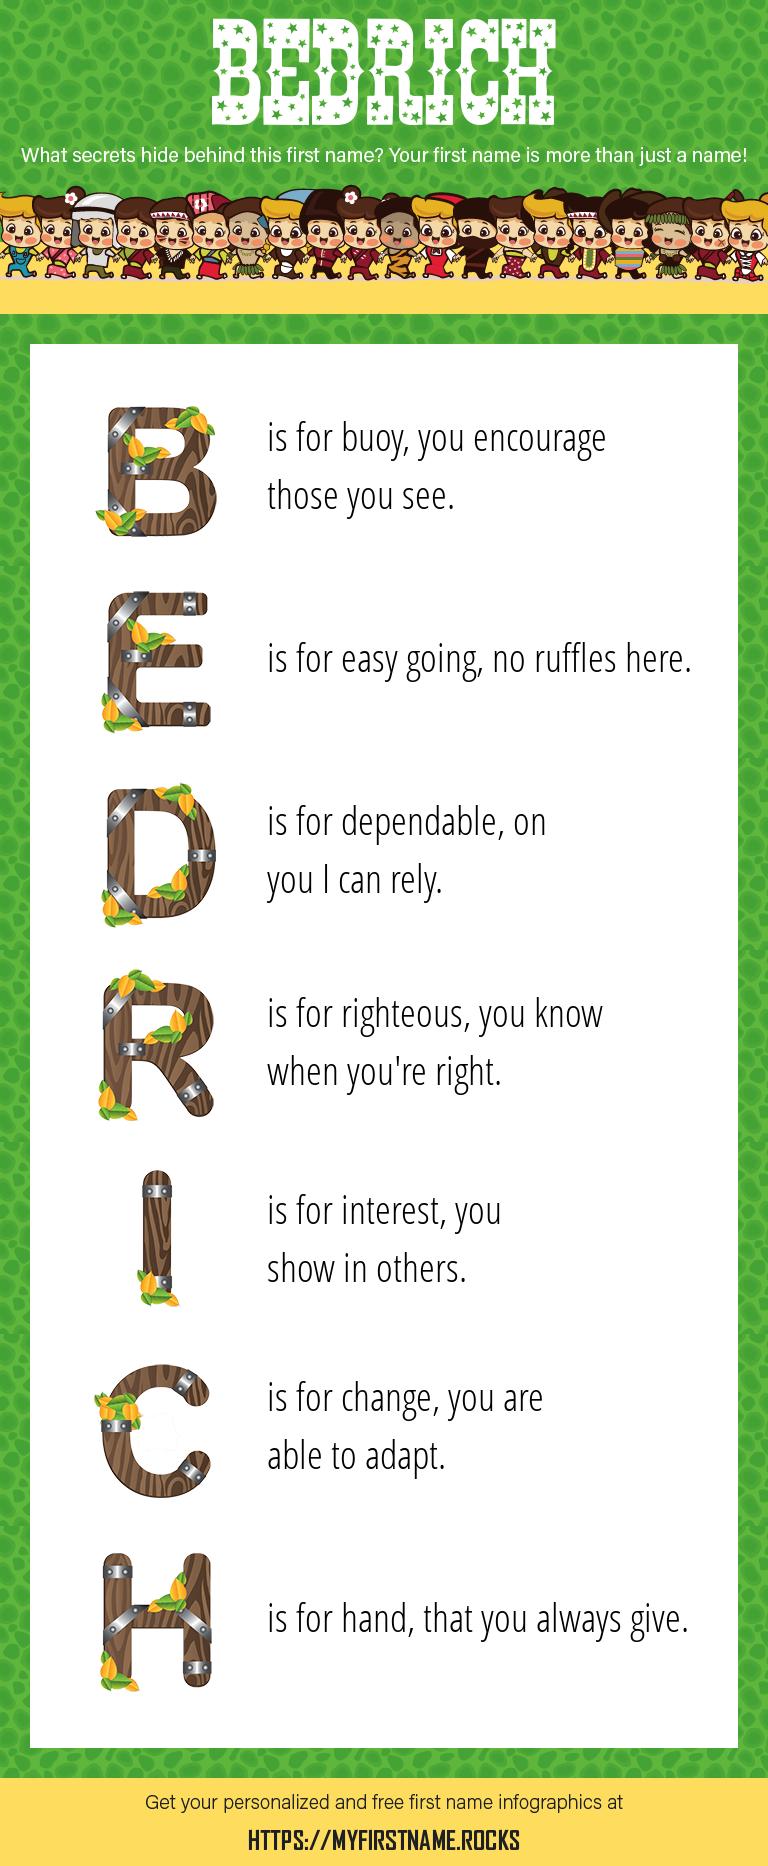 Bedrich Infographics